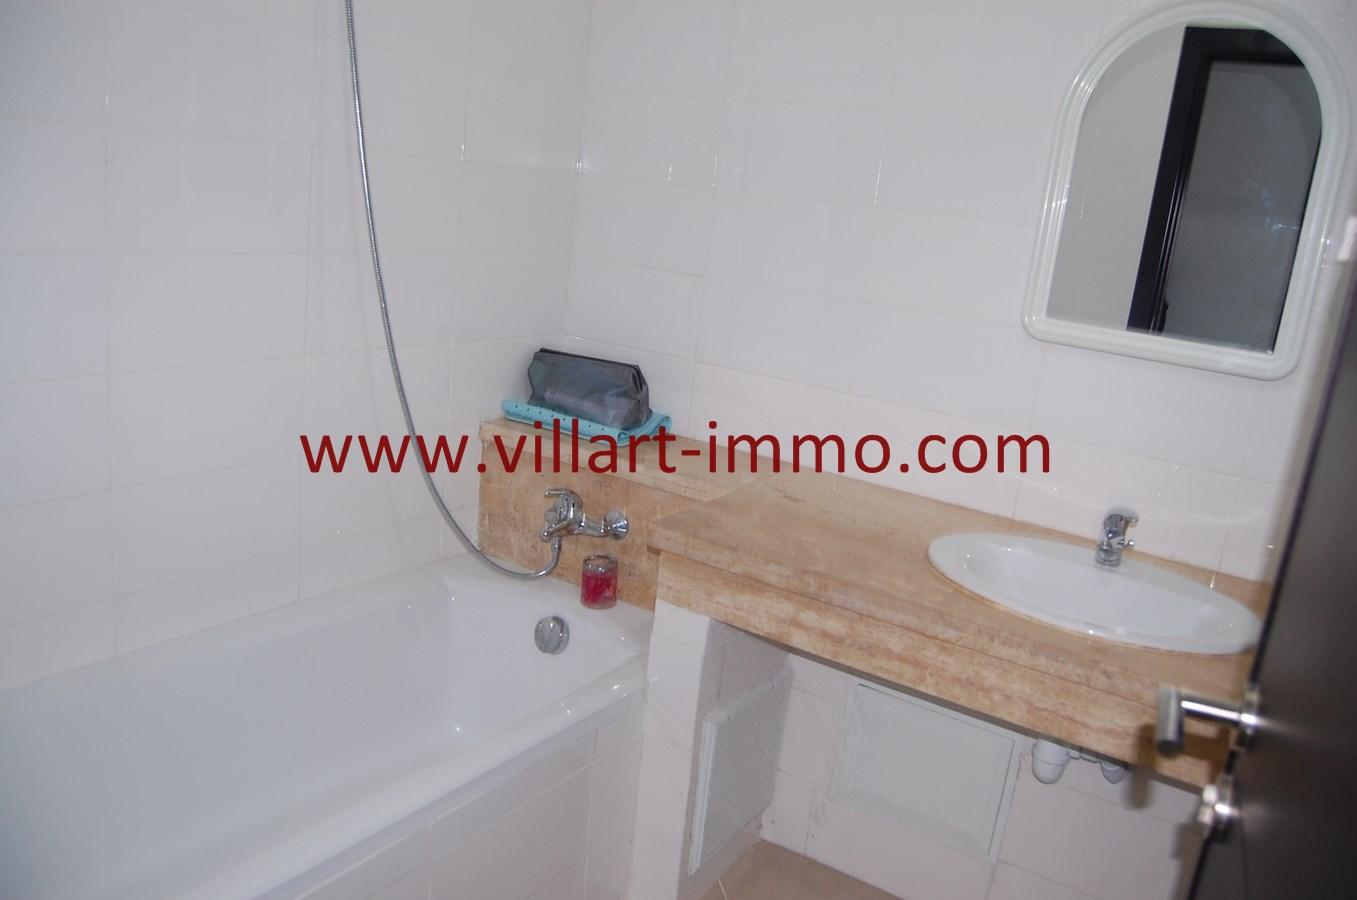 8-Vente-Appartement-Tanger-Route-de-Rabat-salle-de-Bain 1-VA474-Villart Immo